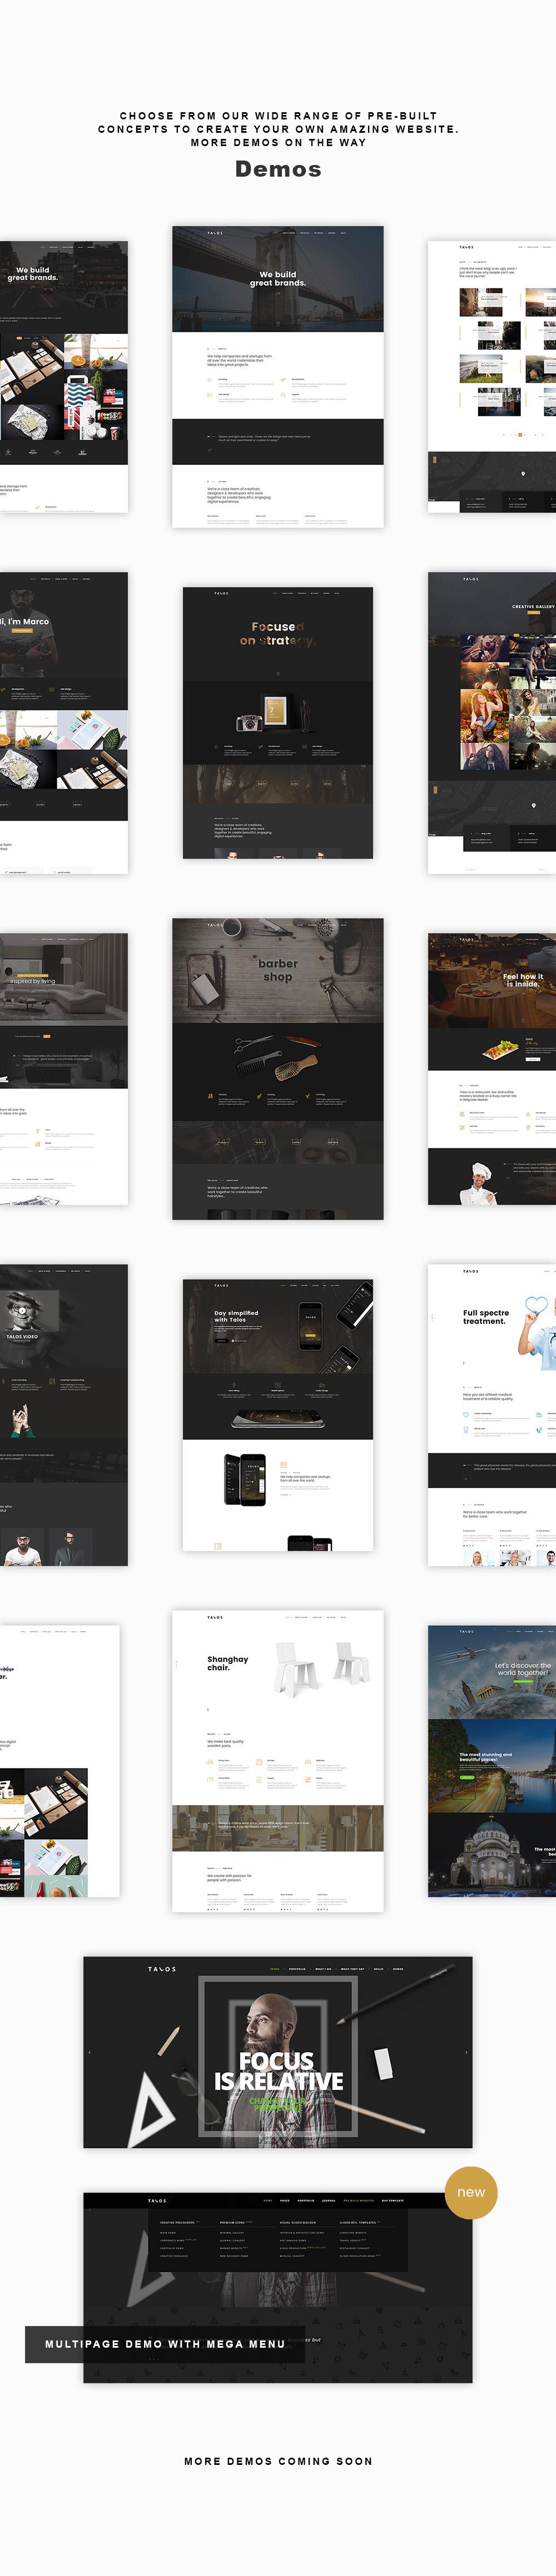 Talos 1 - Creative Multipurpose WordPress Theme